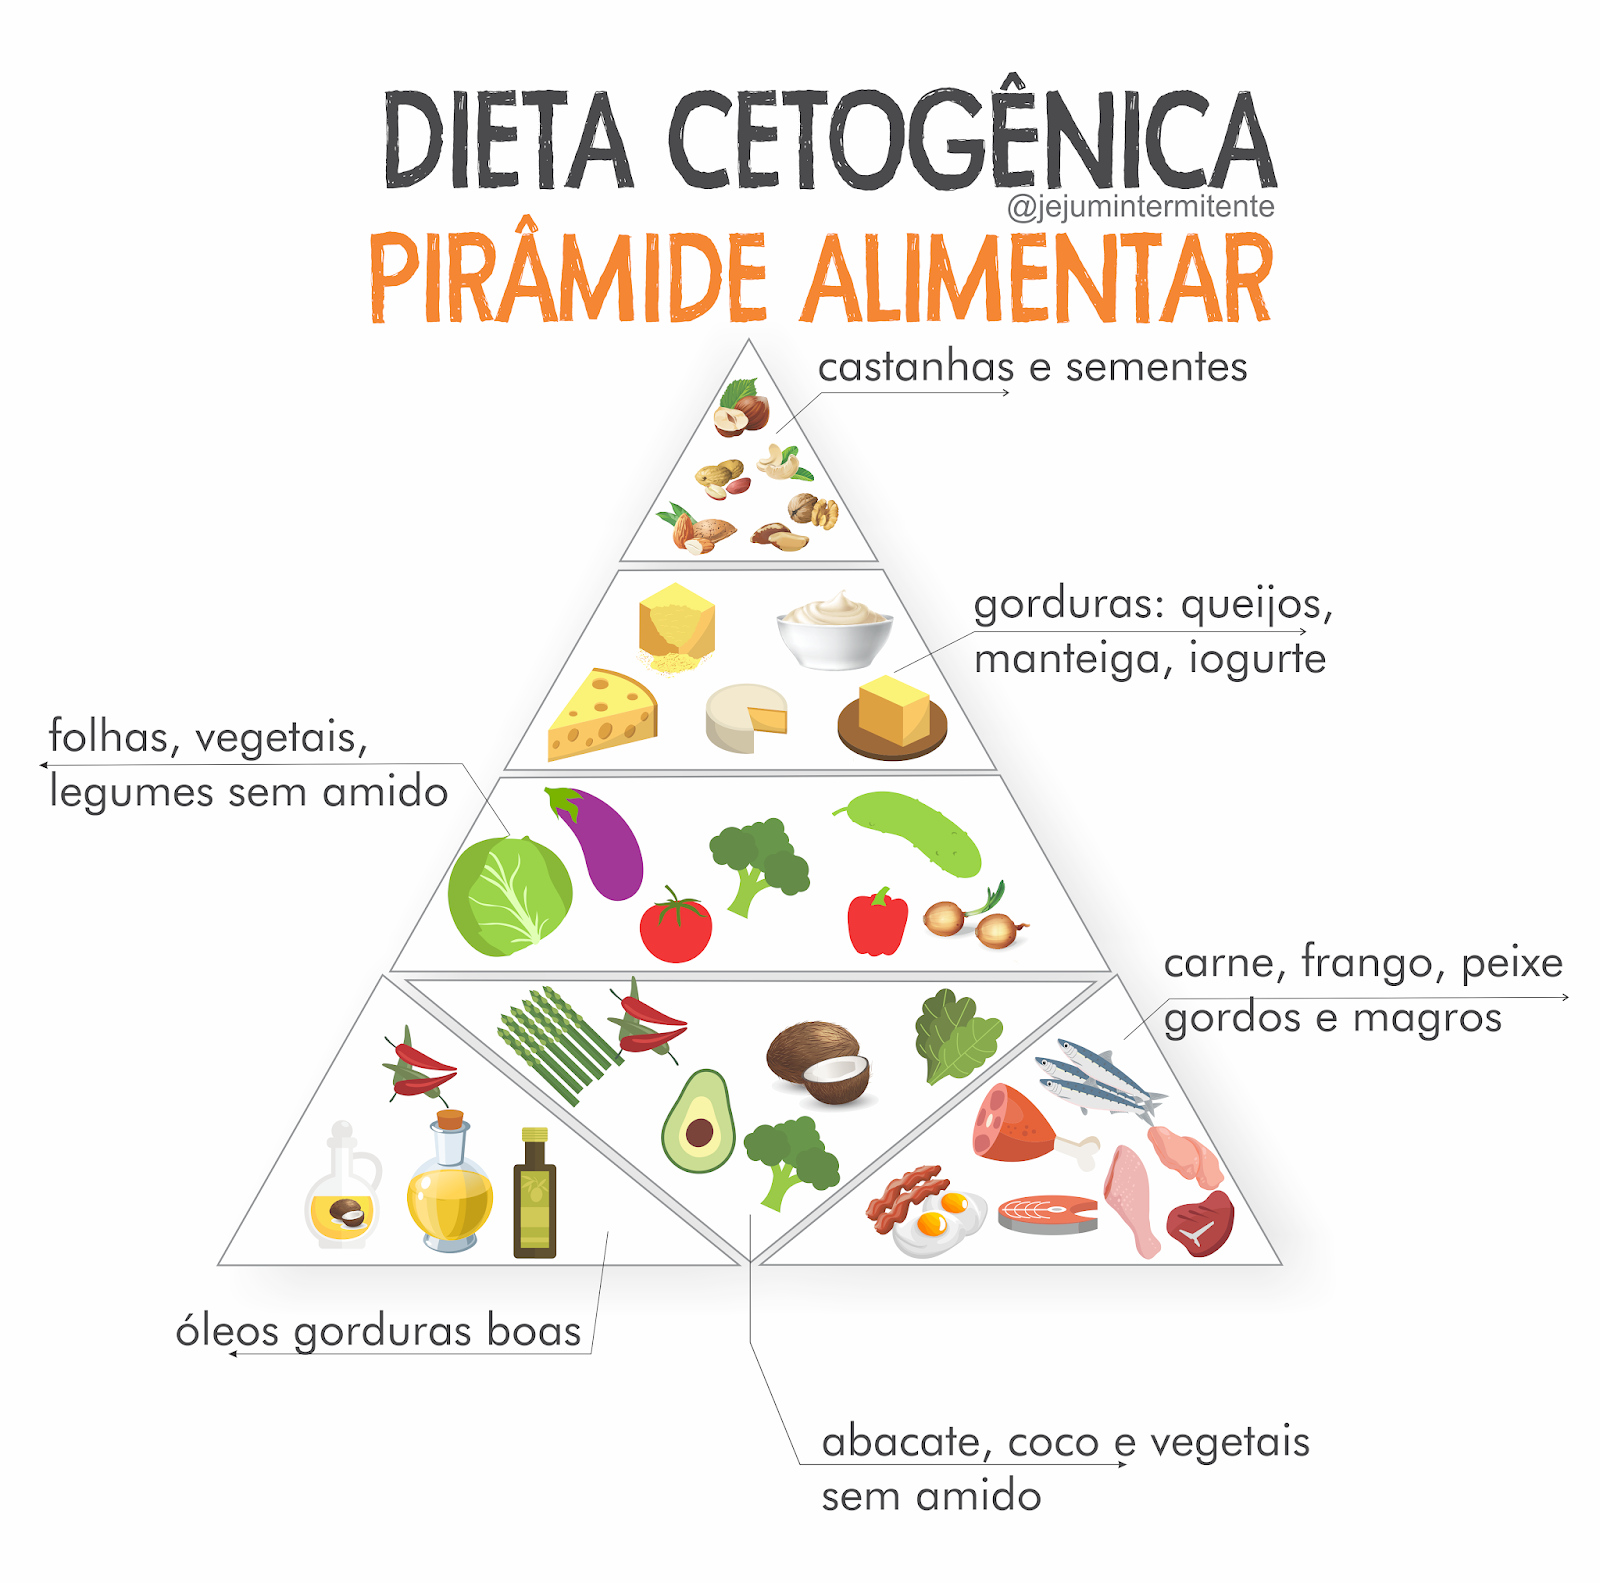 Dieta cetogenica com jejum intermitente